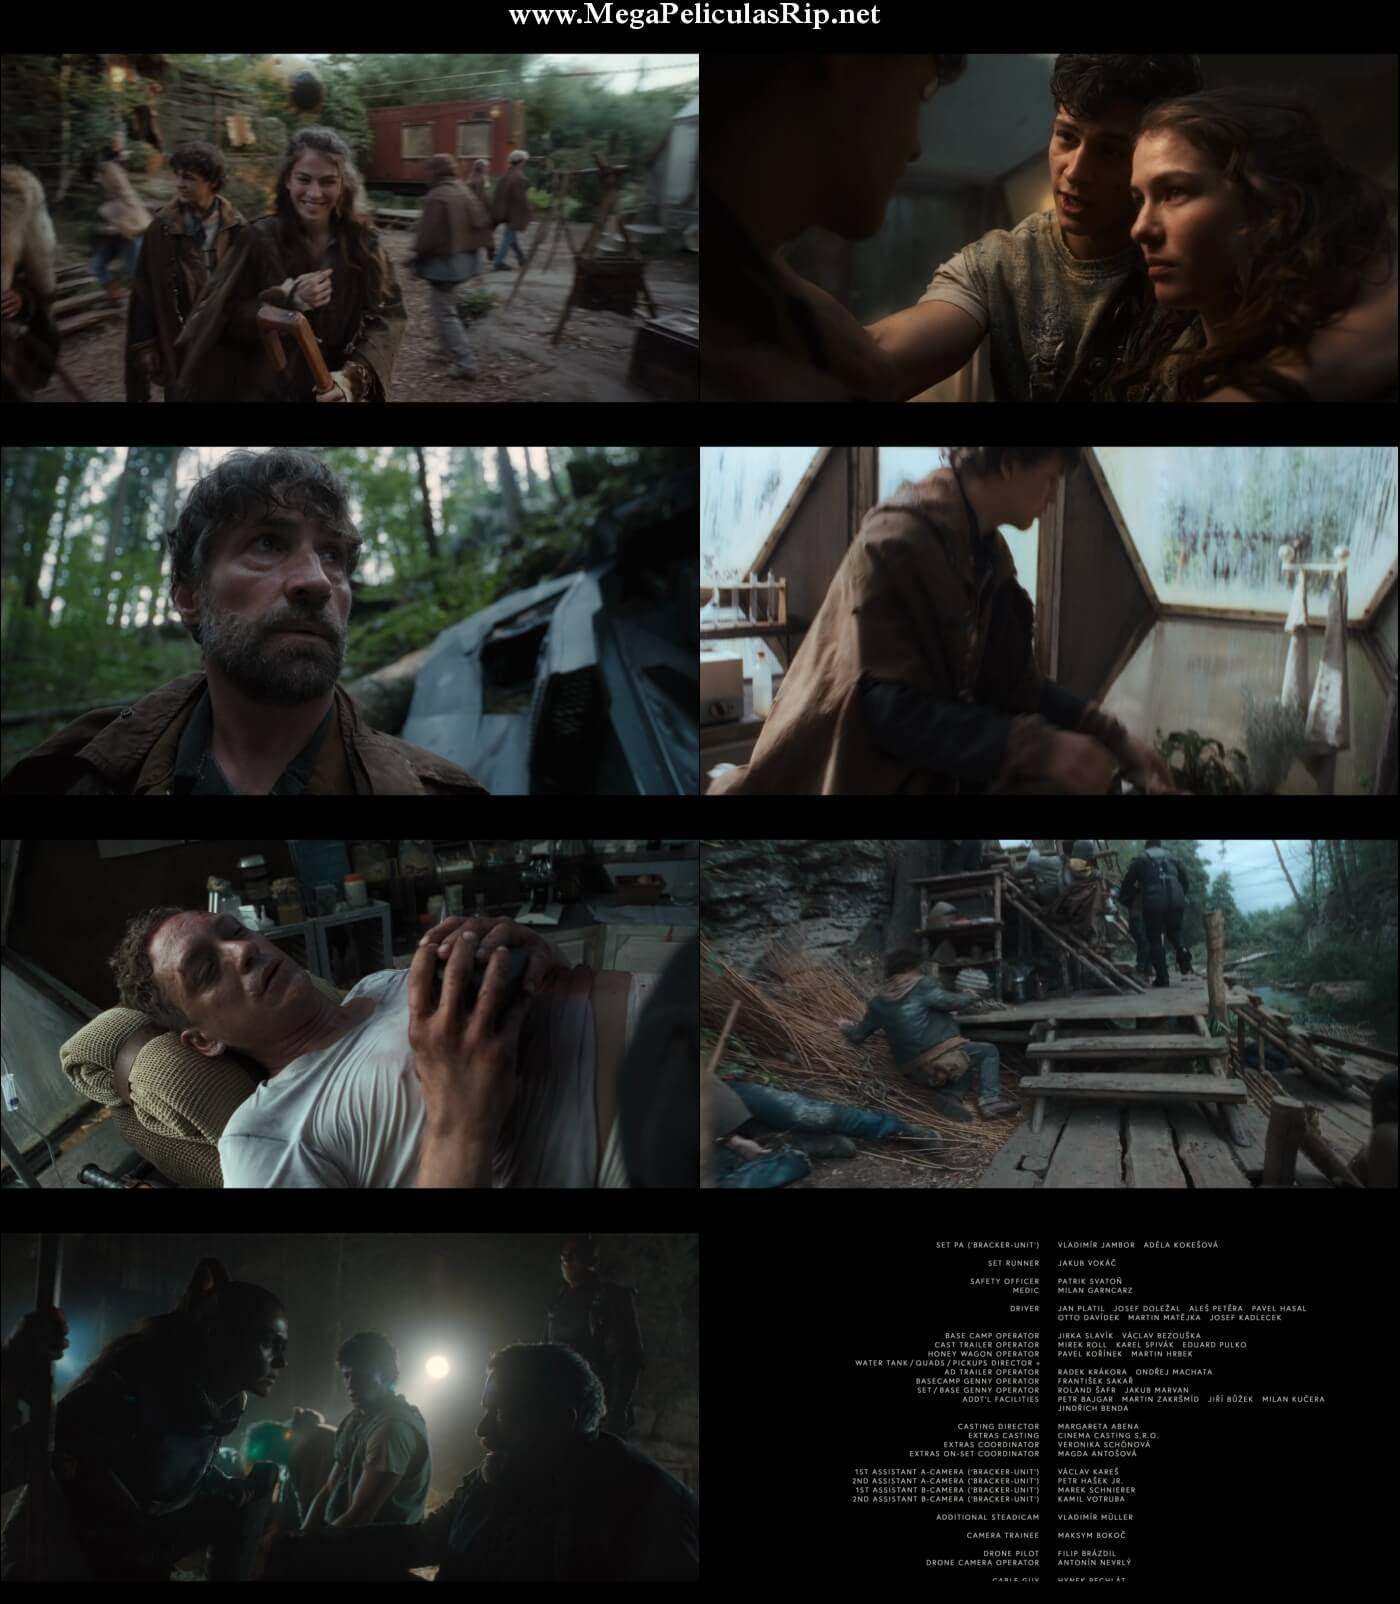 Tribus De Europa Temporada 1 1080p Latino